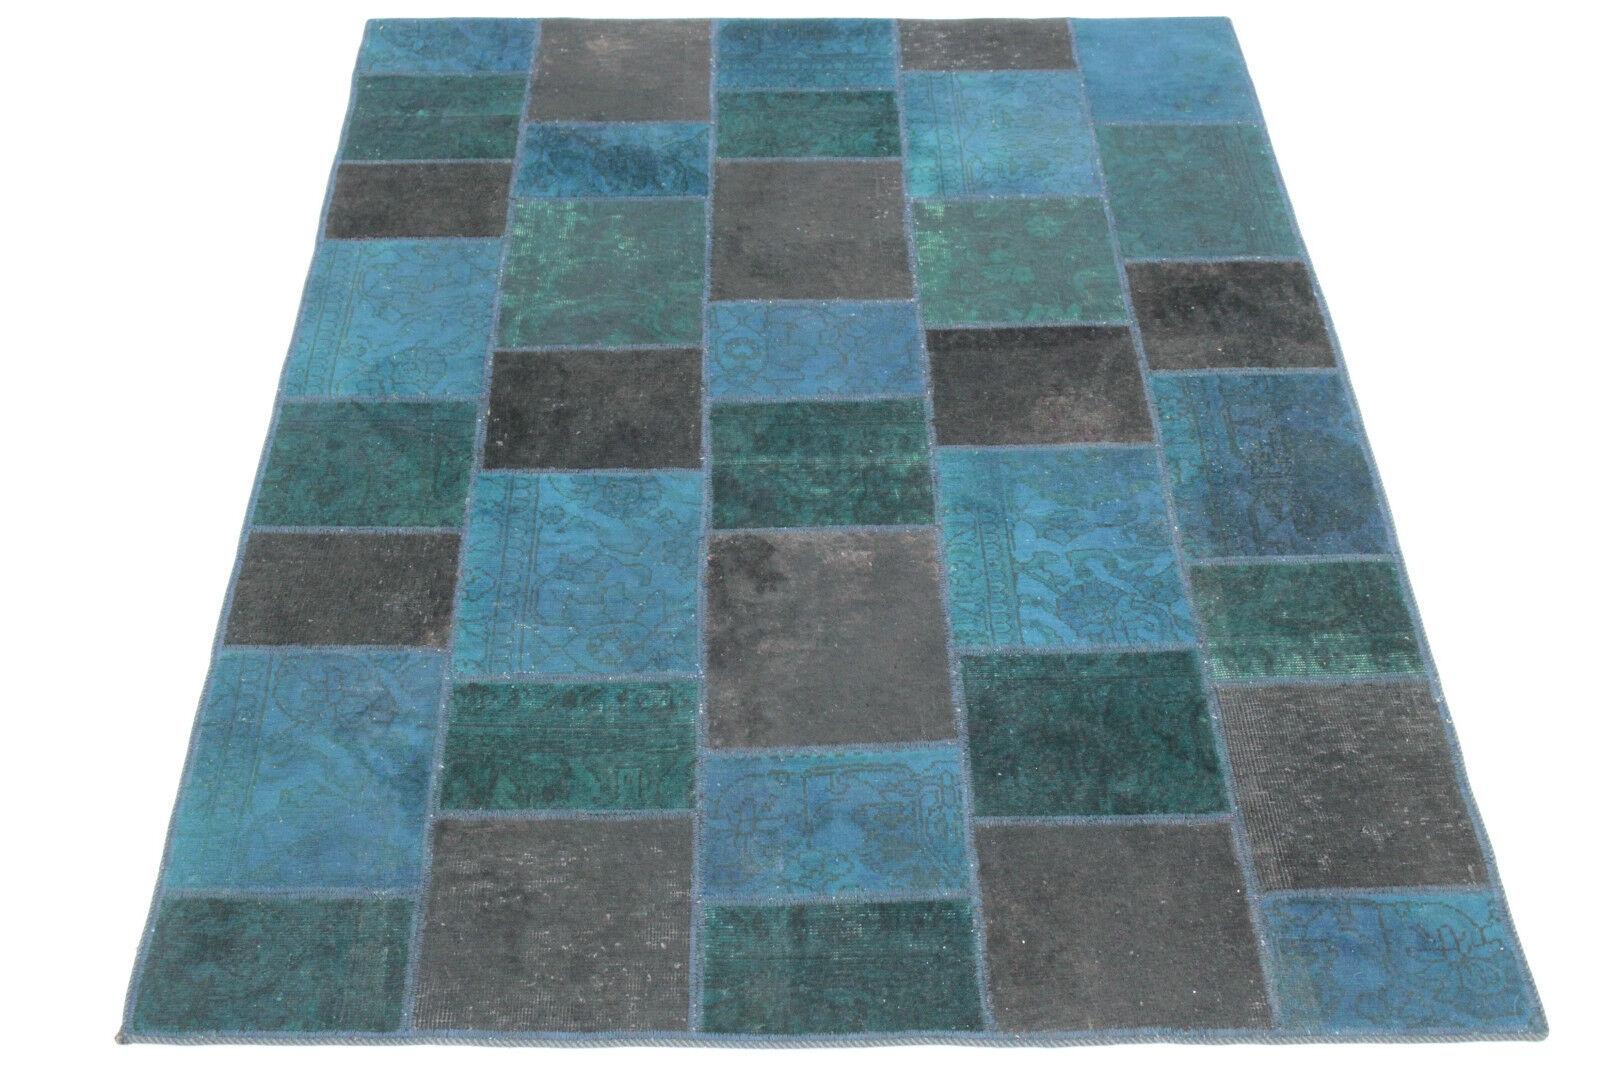 Tappeto Moderno Turchese : Patchwork tappeto orientale orientale orientale vintage blu